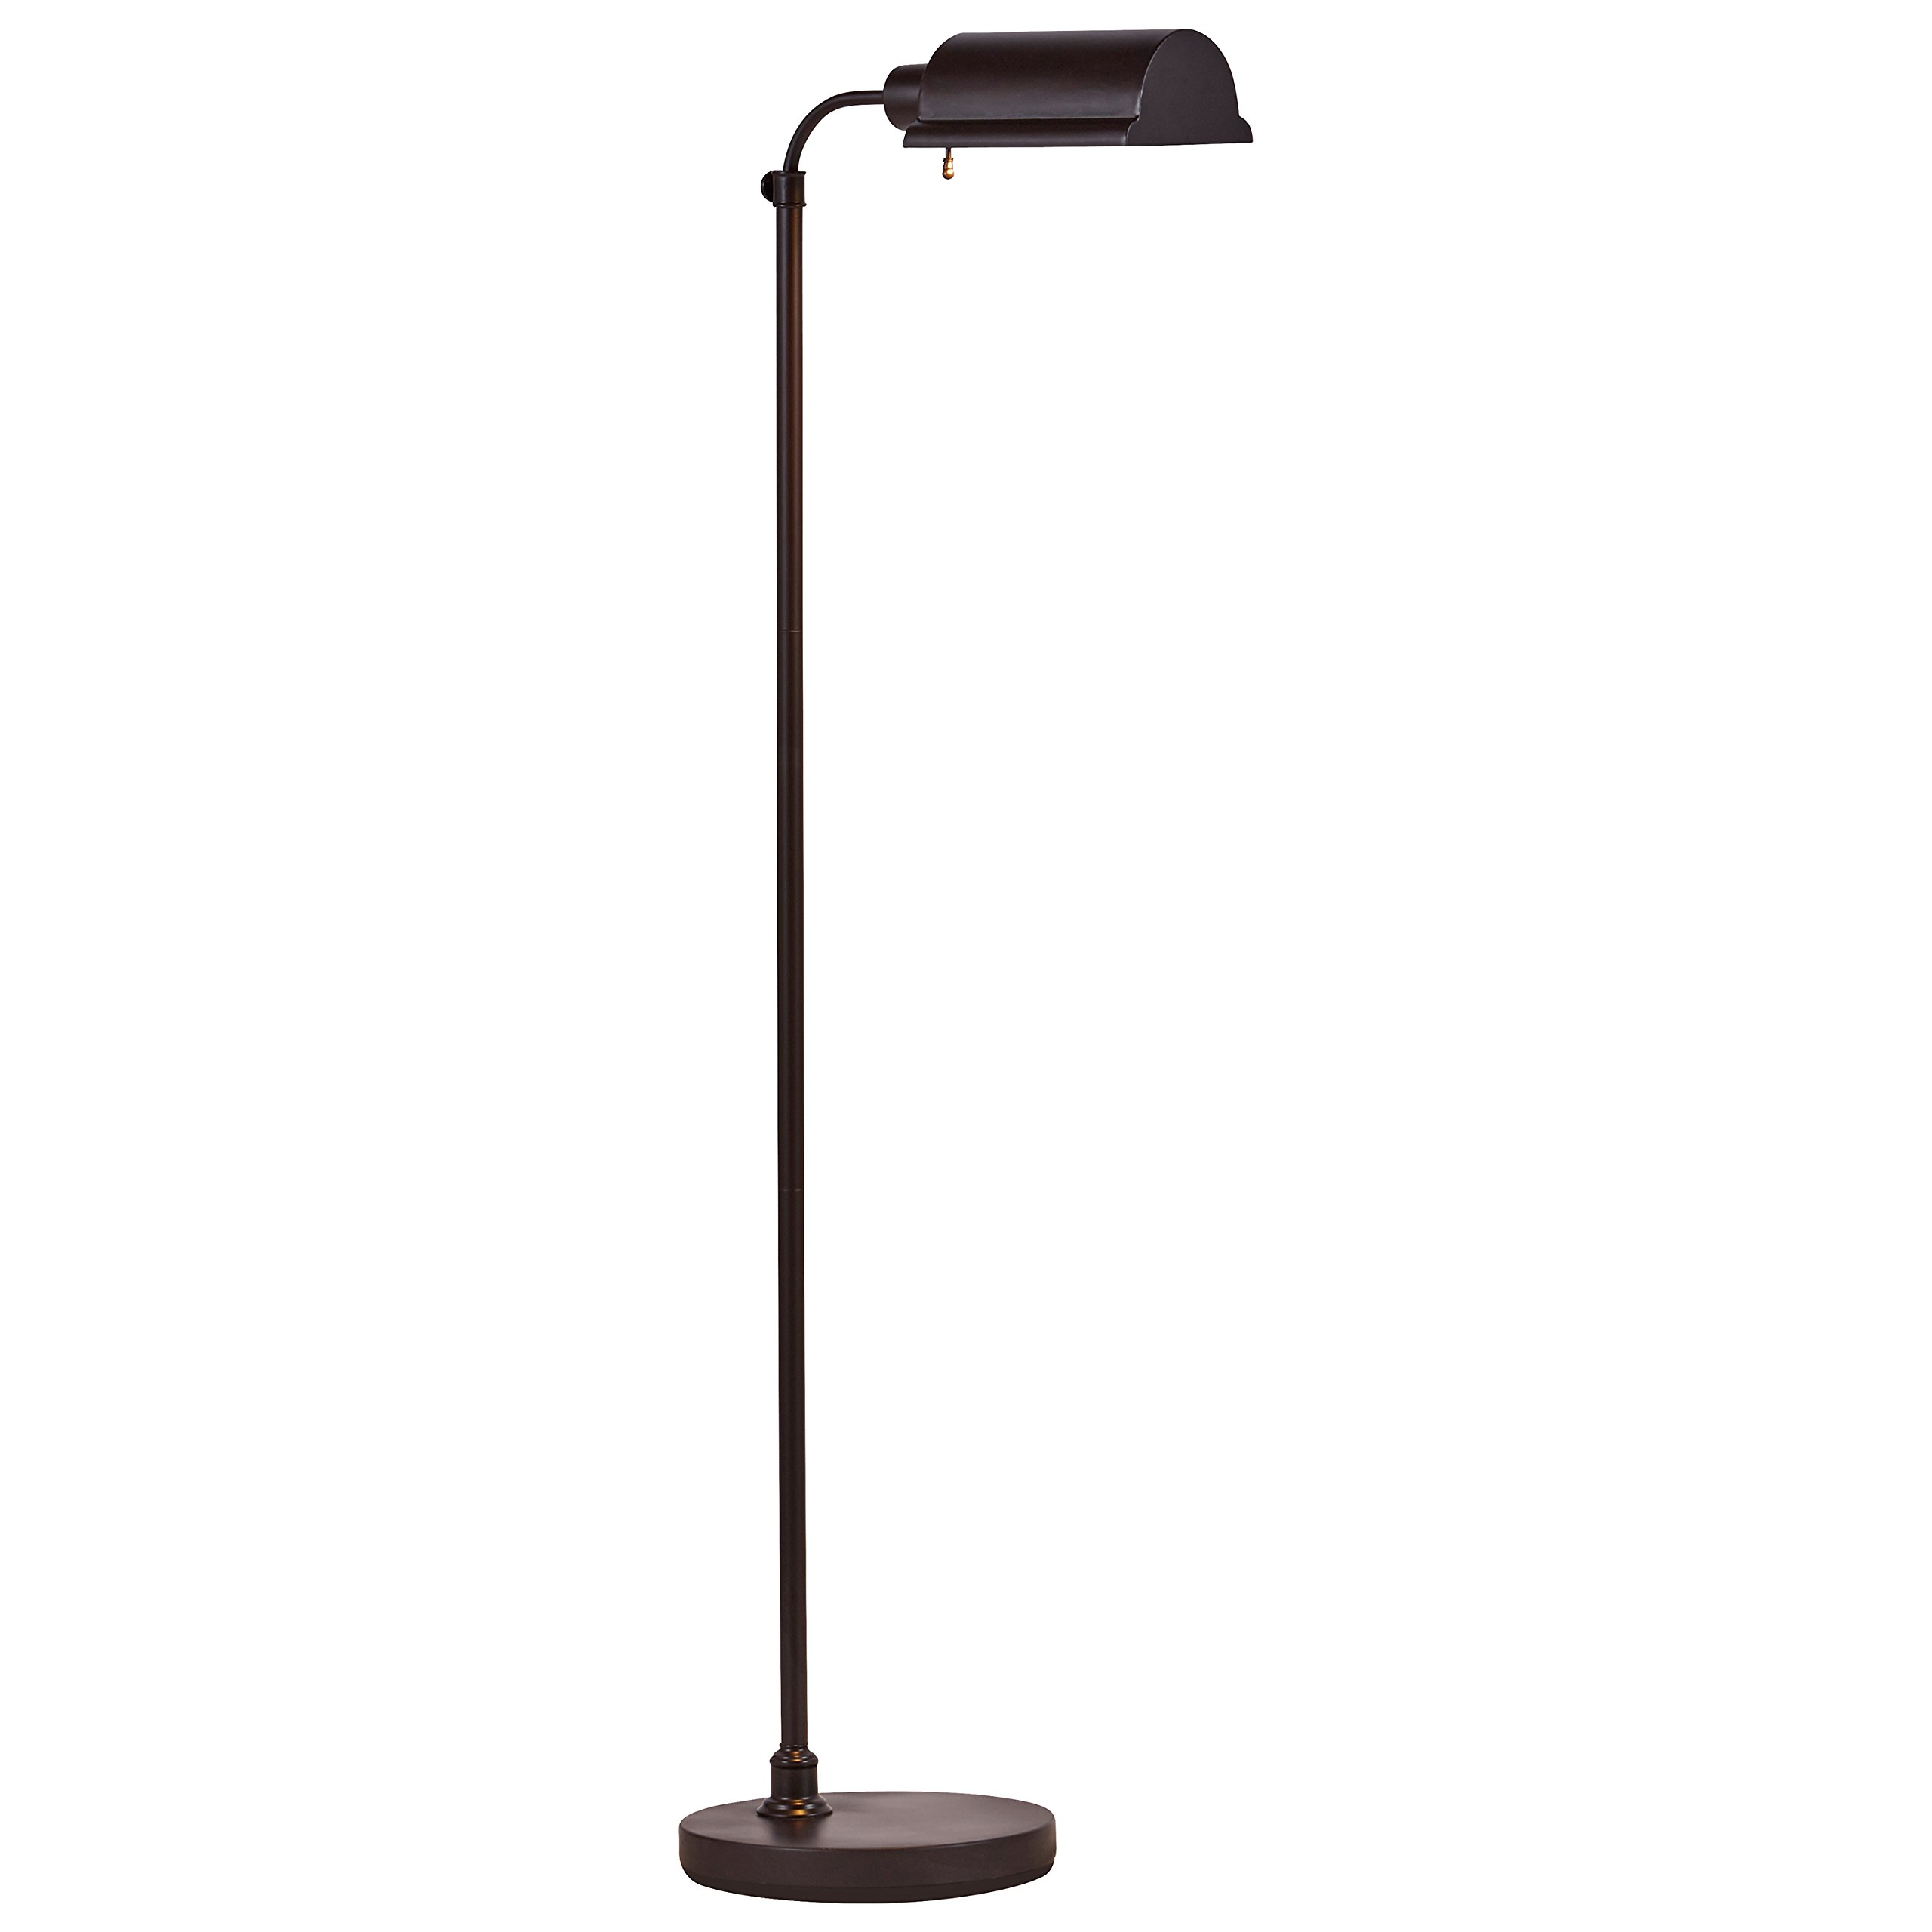 Stone & Beam Modern Pharmacy Floor Lamp, 48''H, With Bulb by Stone & Beam